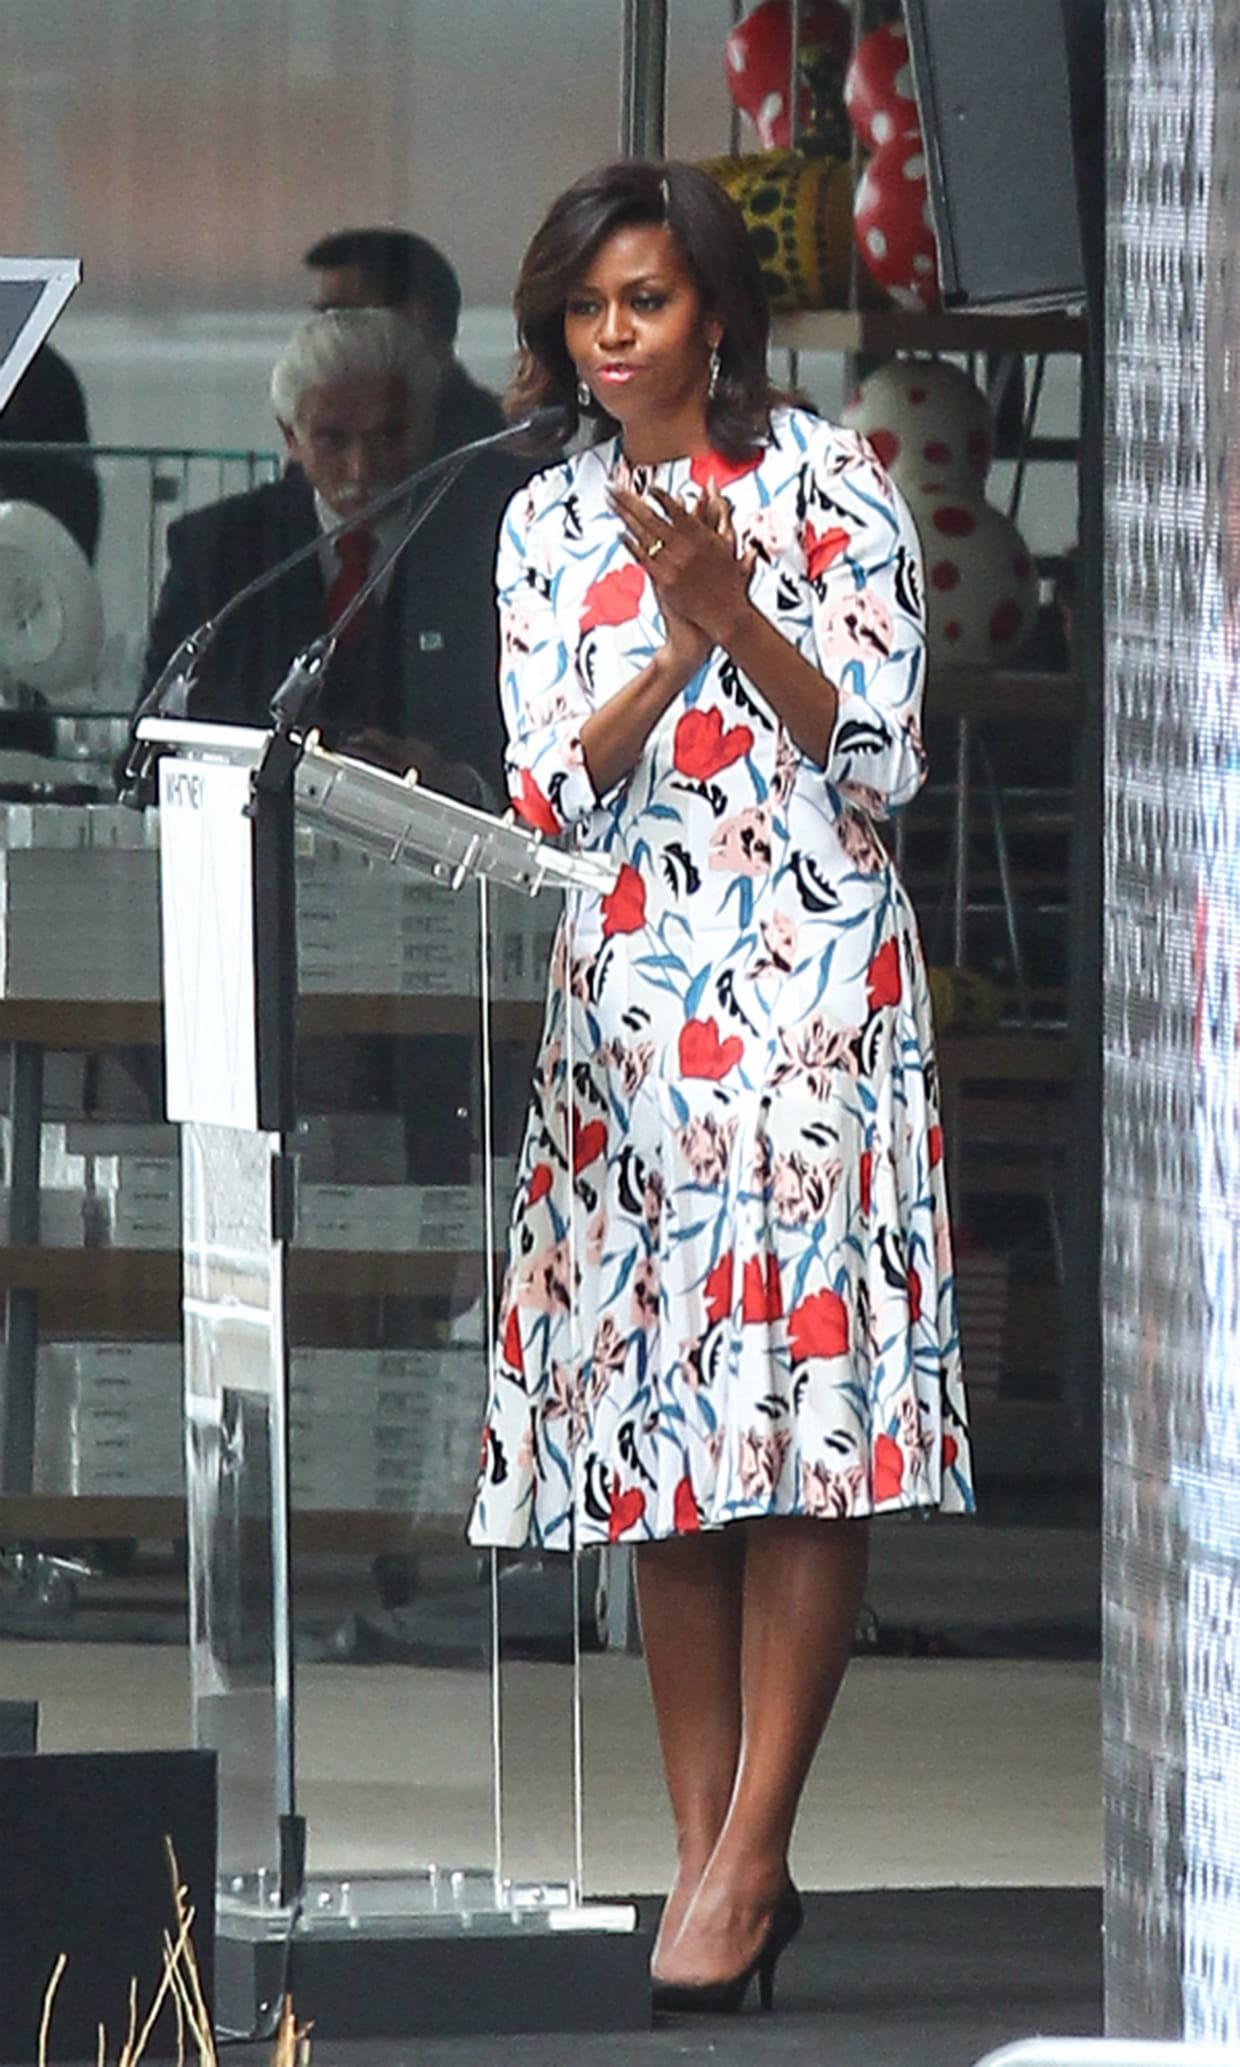 Robe Obama En Fleurs À Michelle OkiZPXuT